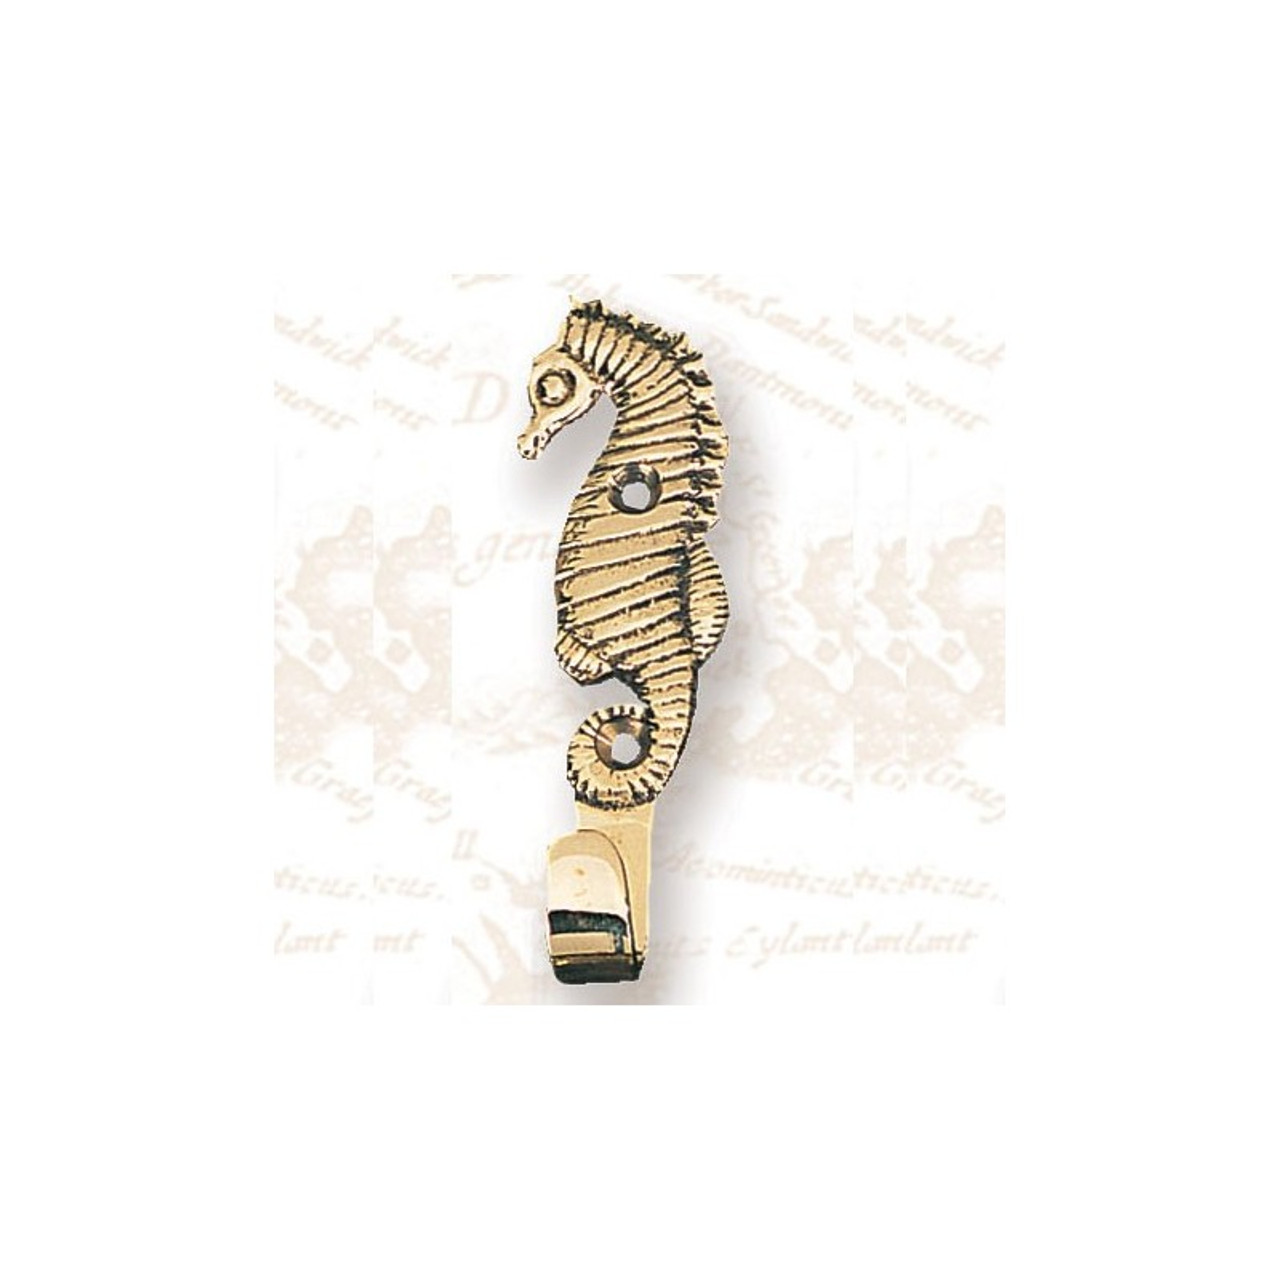 Brass Coat Hanger - Seahorse